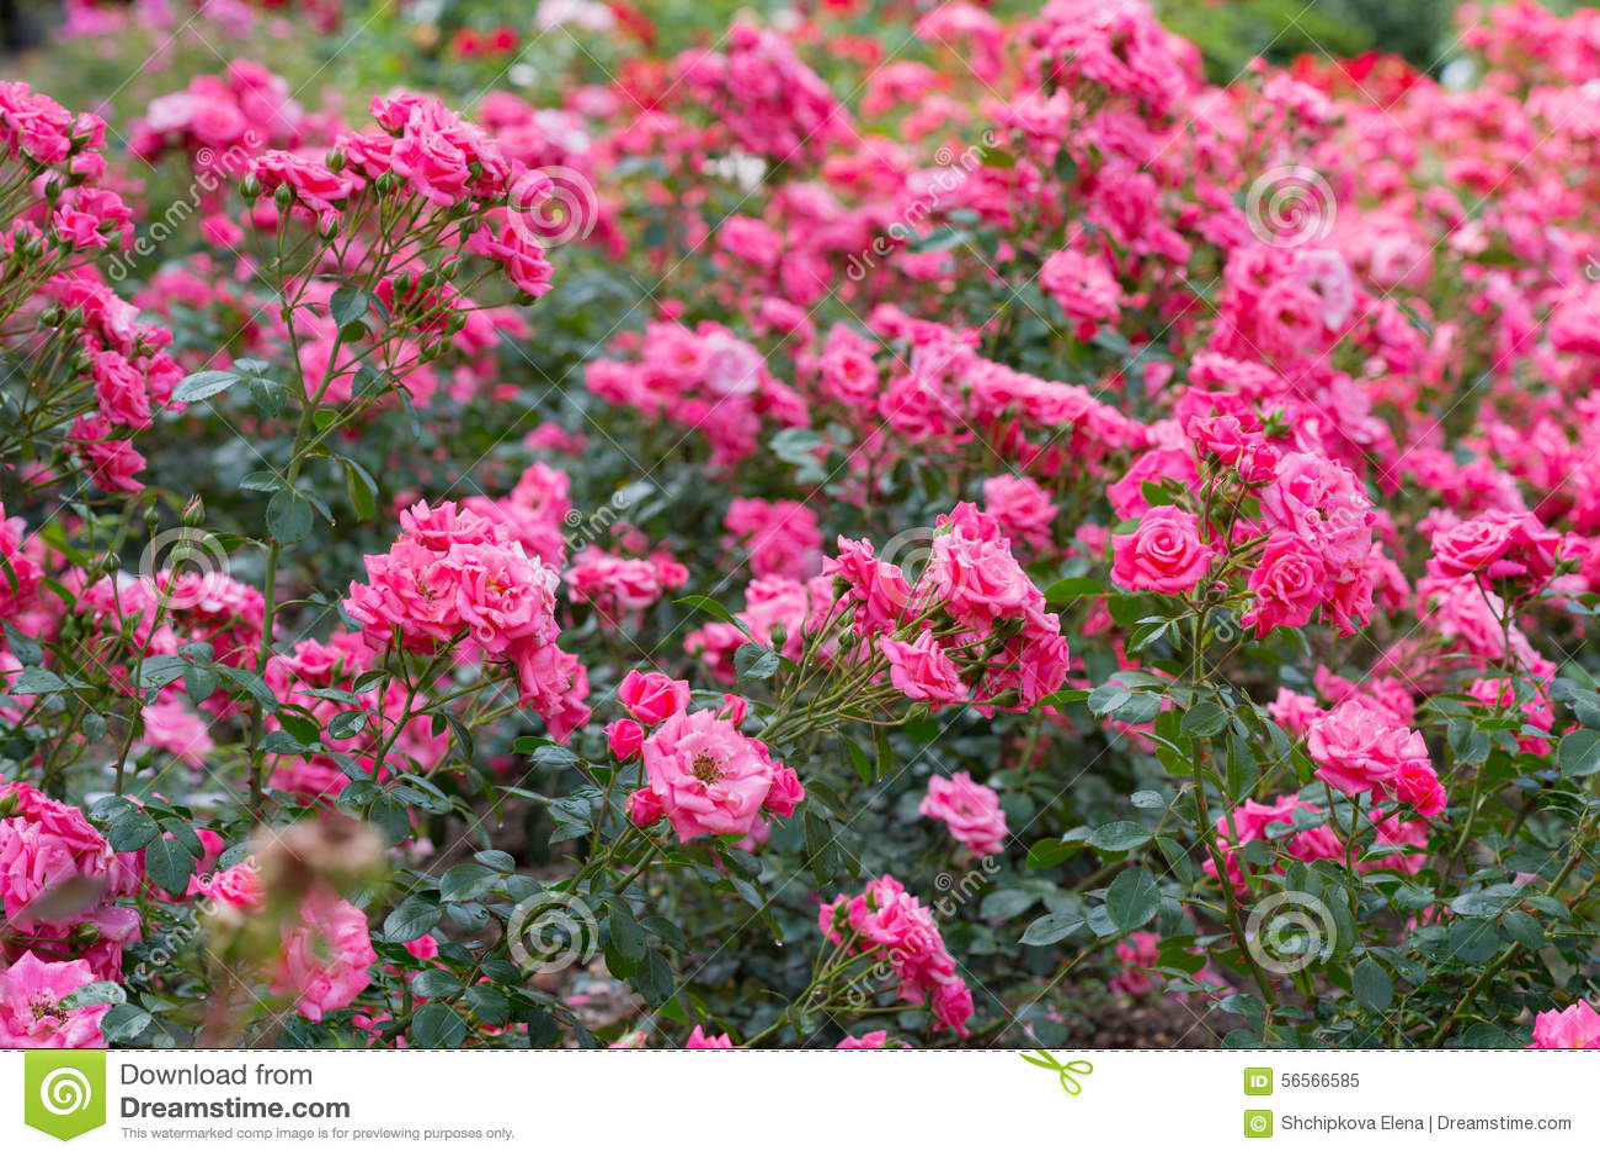 Download ρόδινα τριαντάφυλλα στοκ εικόνα. εικόνα από φως, δέσμη - 56566585